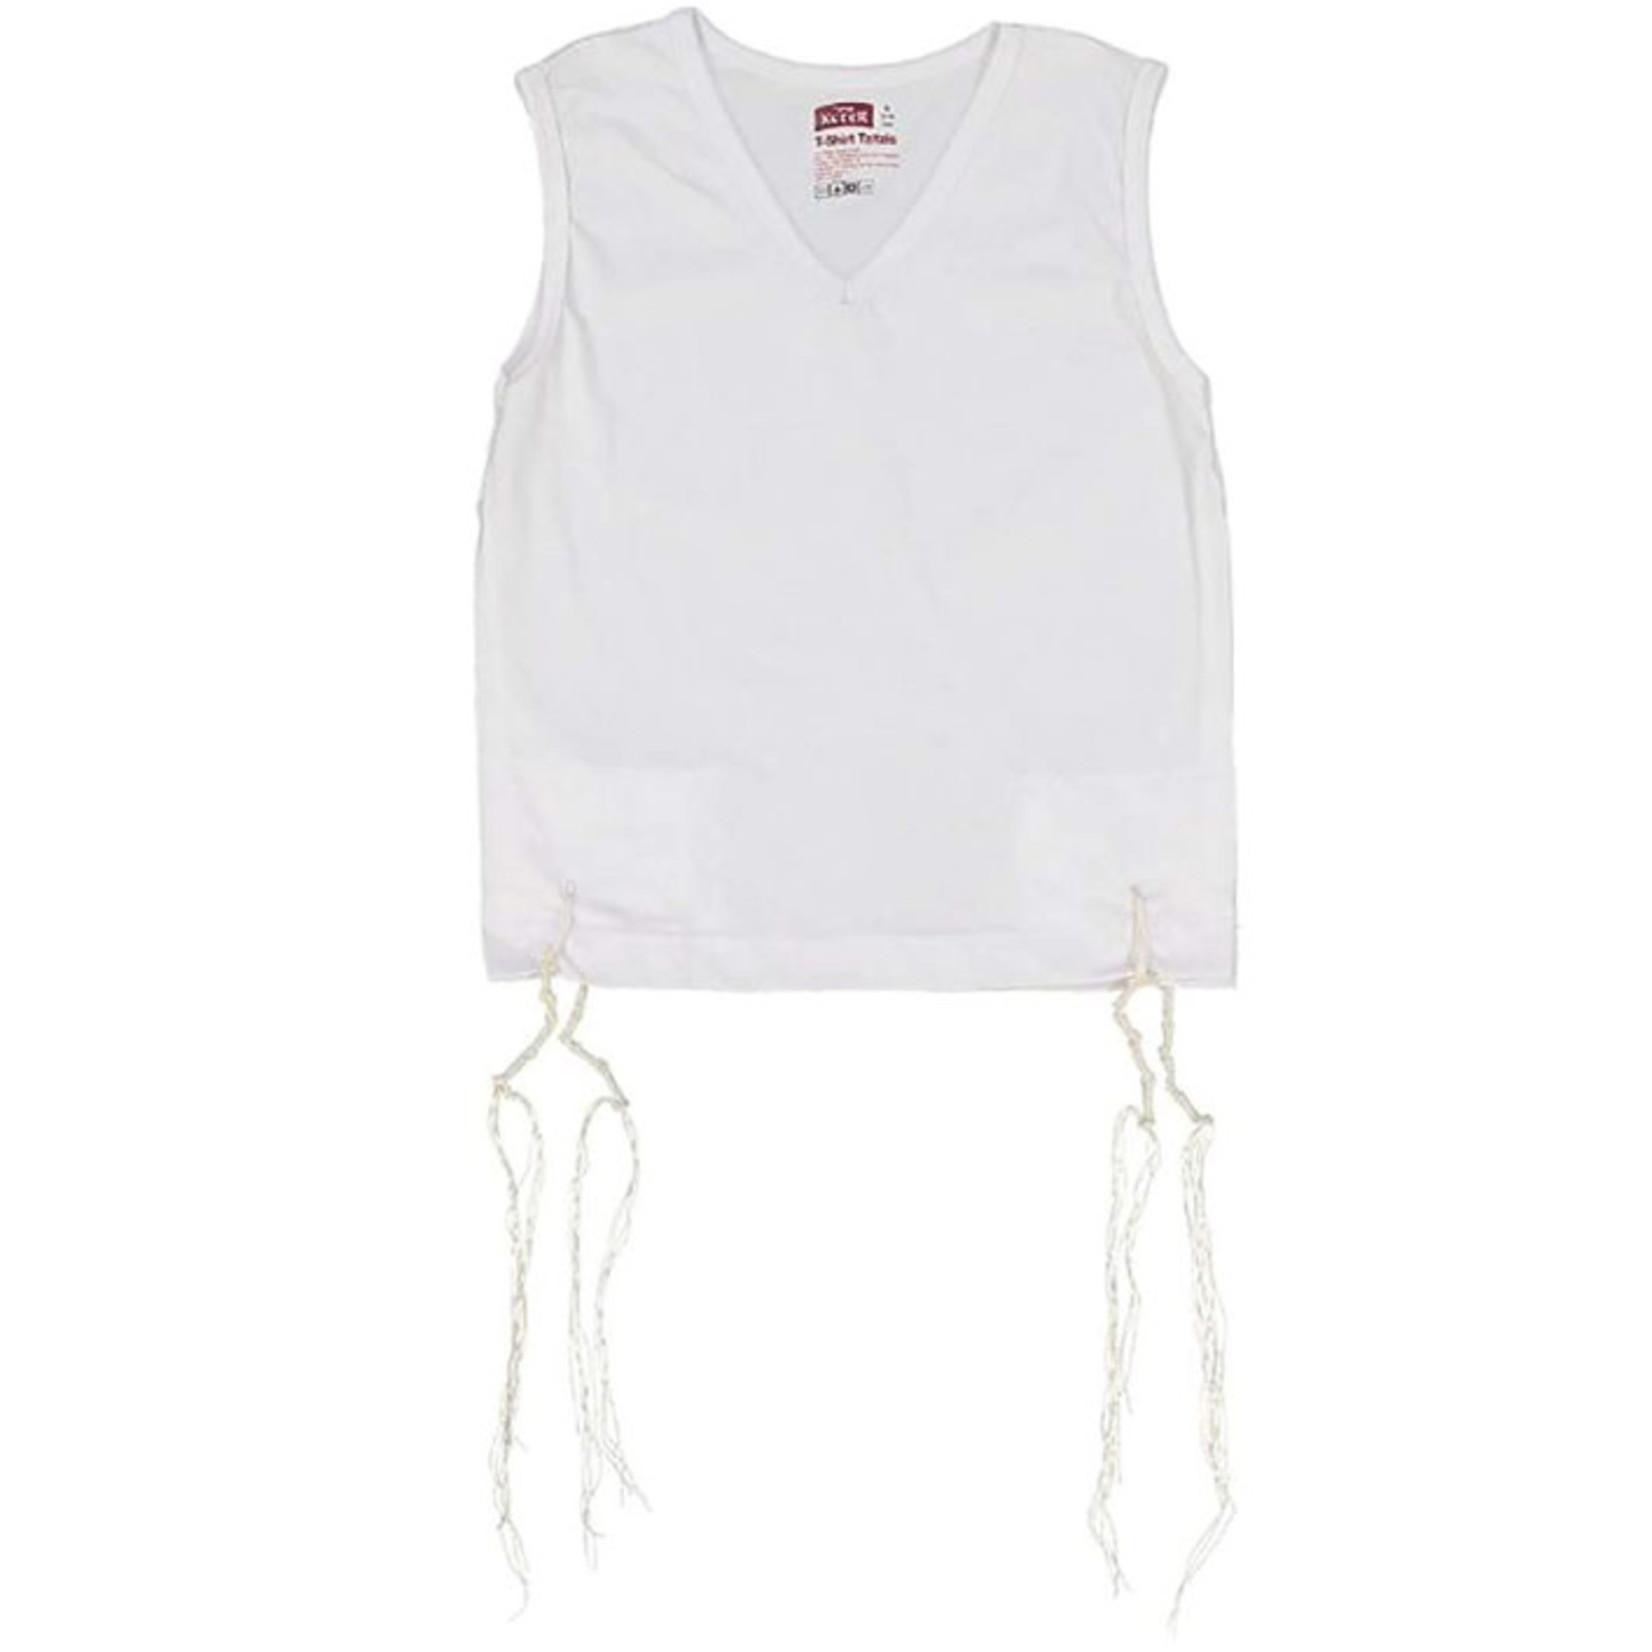 Undershirt-Style Arbah Kanfot, 100% Cotton, V-Neck, Size M